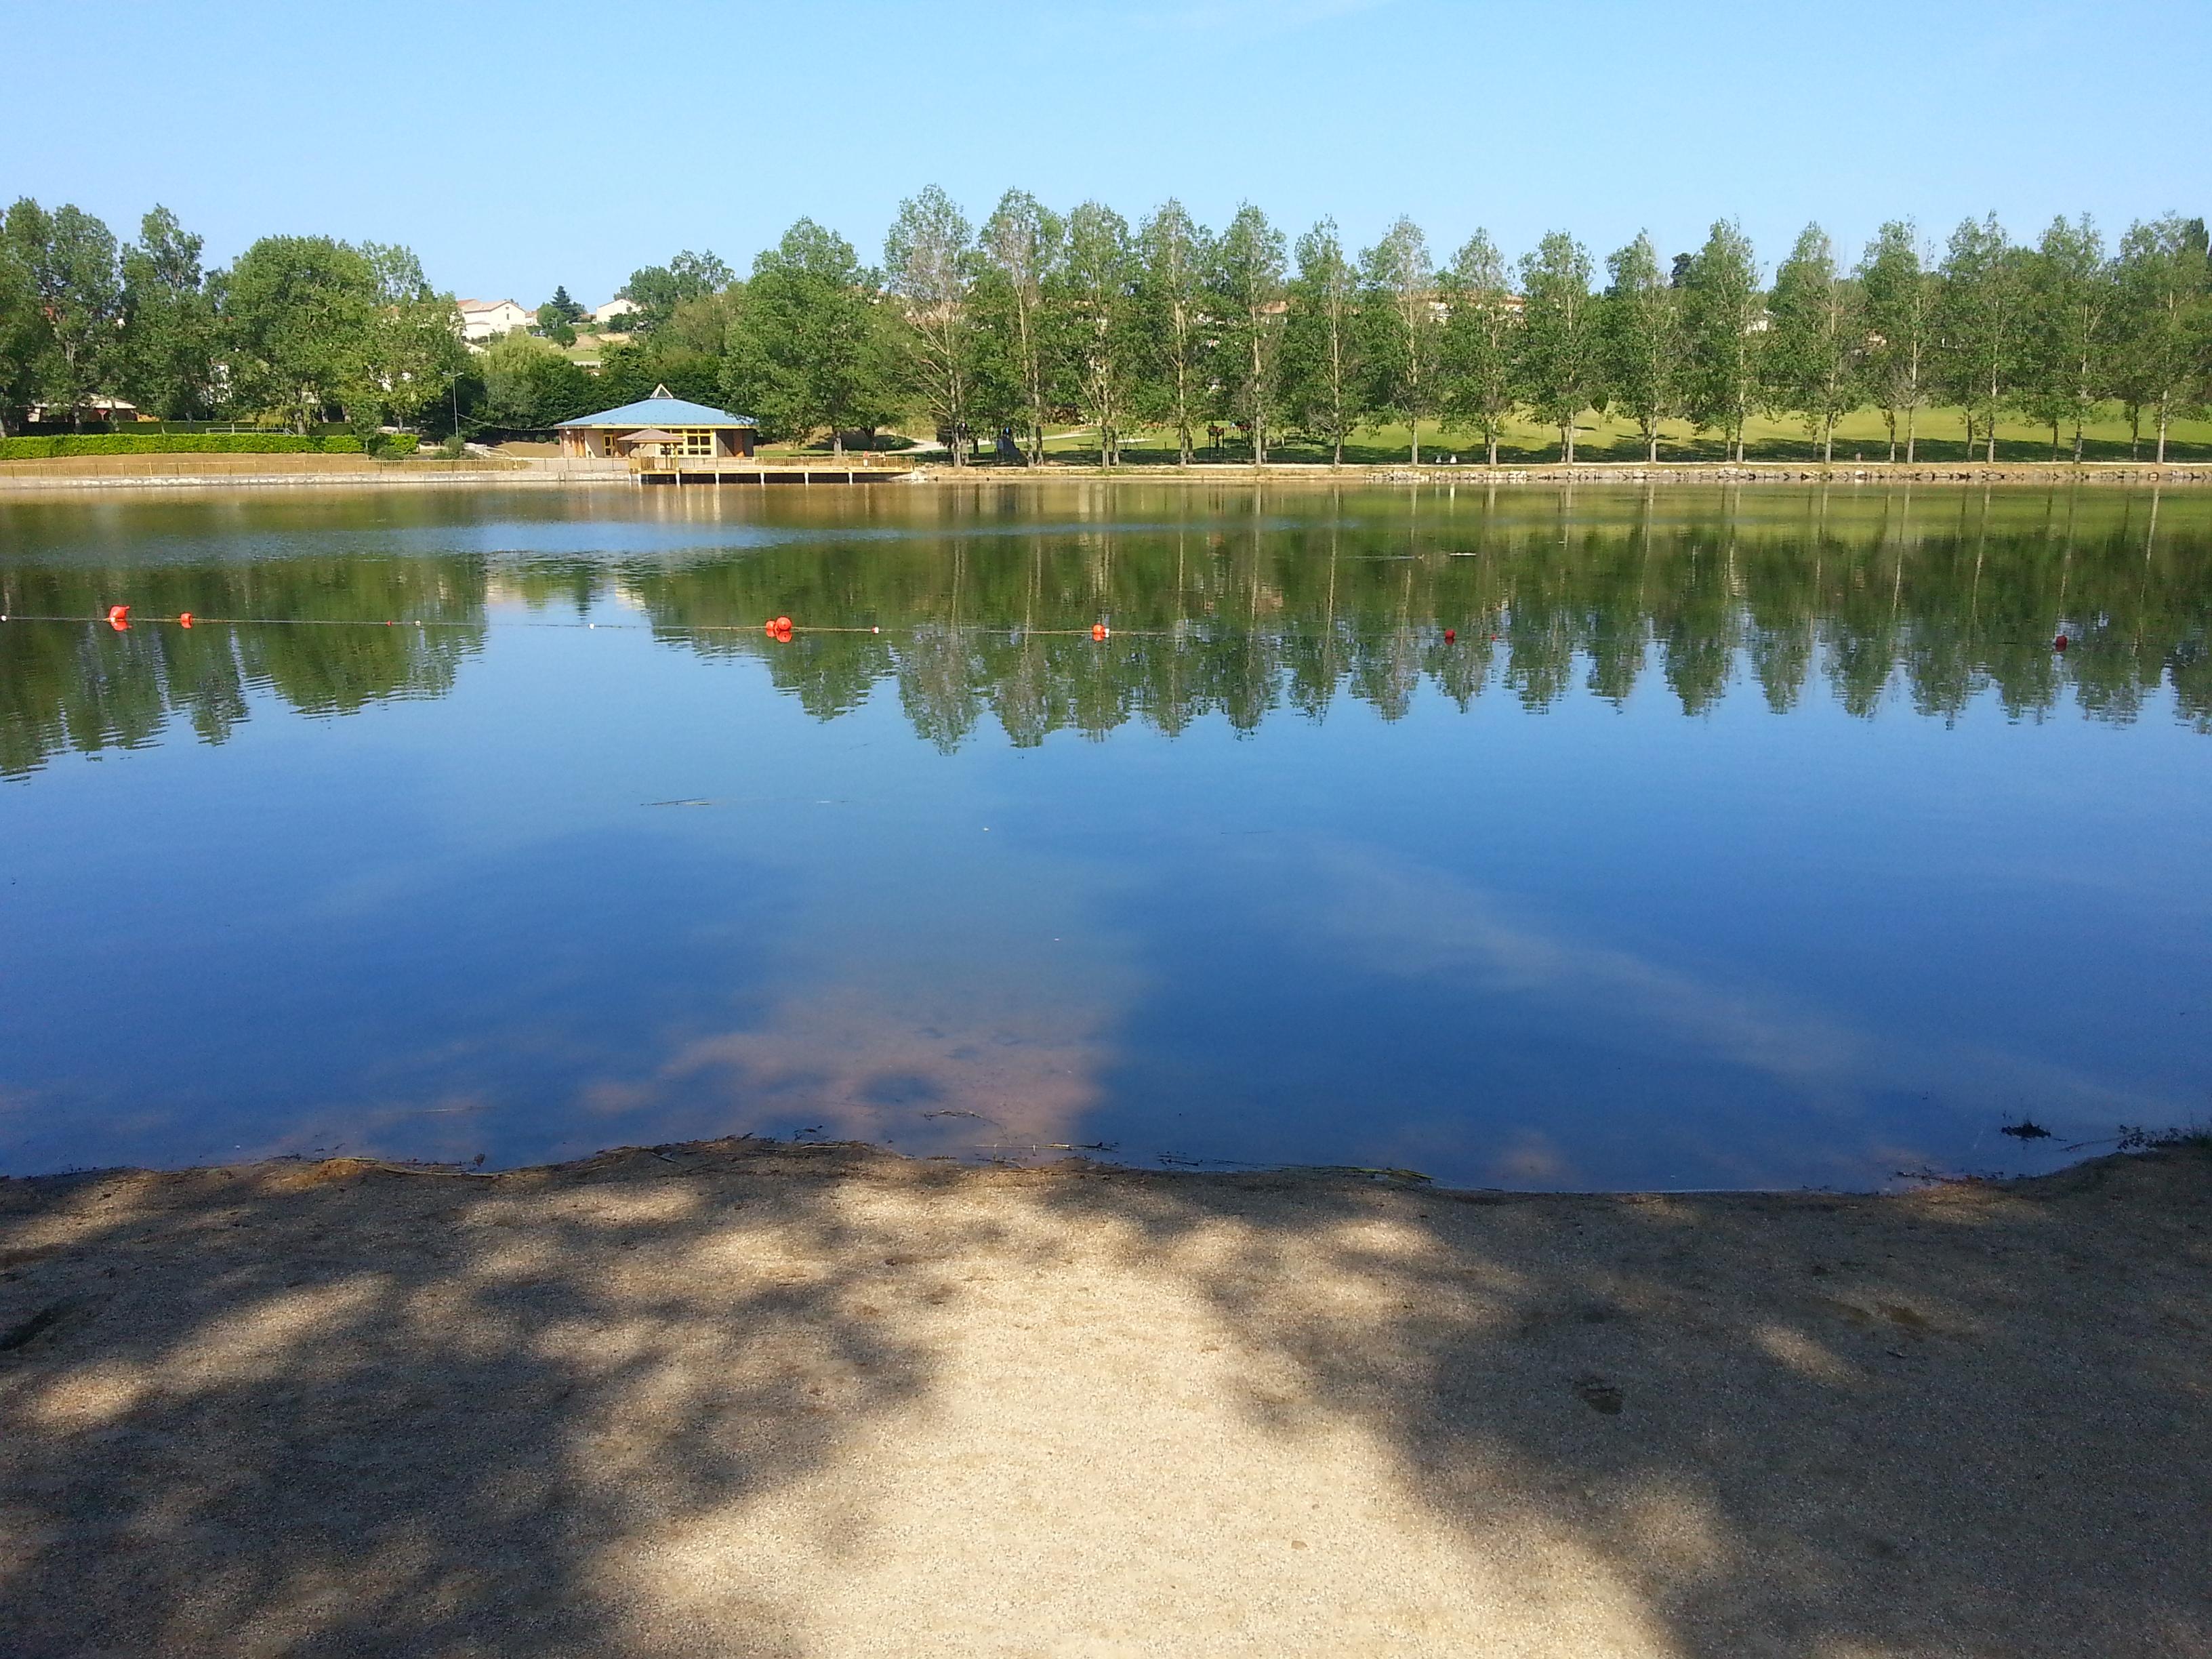 Rivieren, kreken en strandjes aan de oevers van L'Eyrieux : Lac aux Ramiers Beach